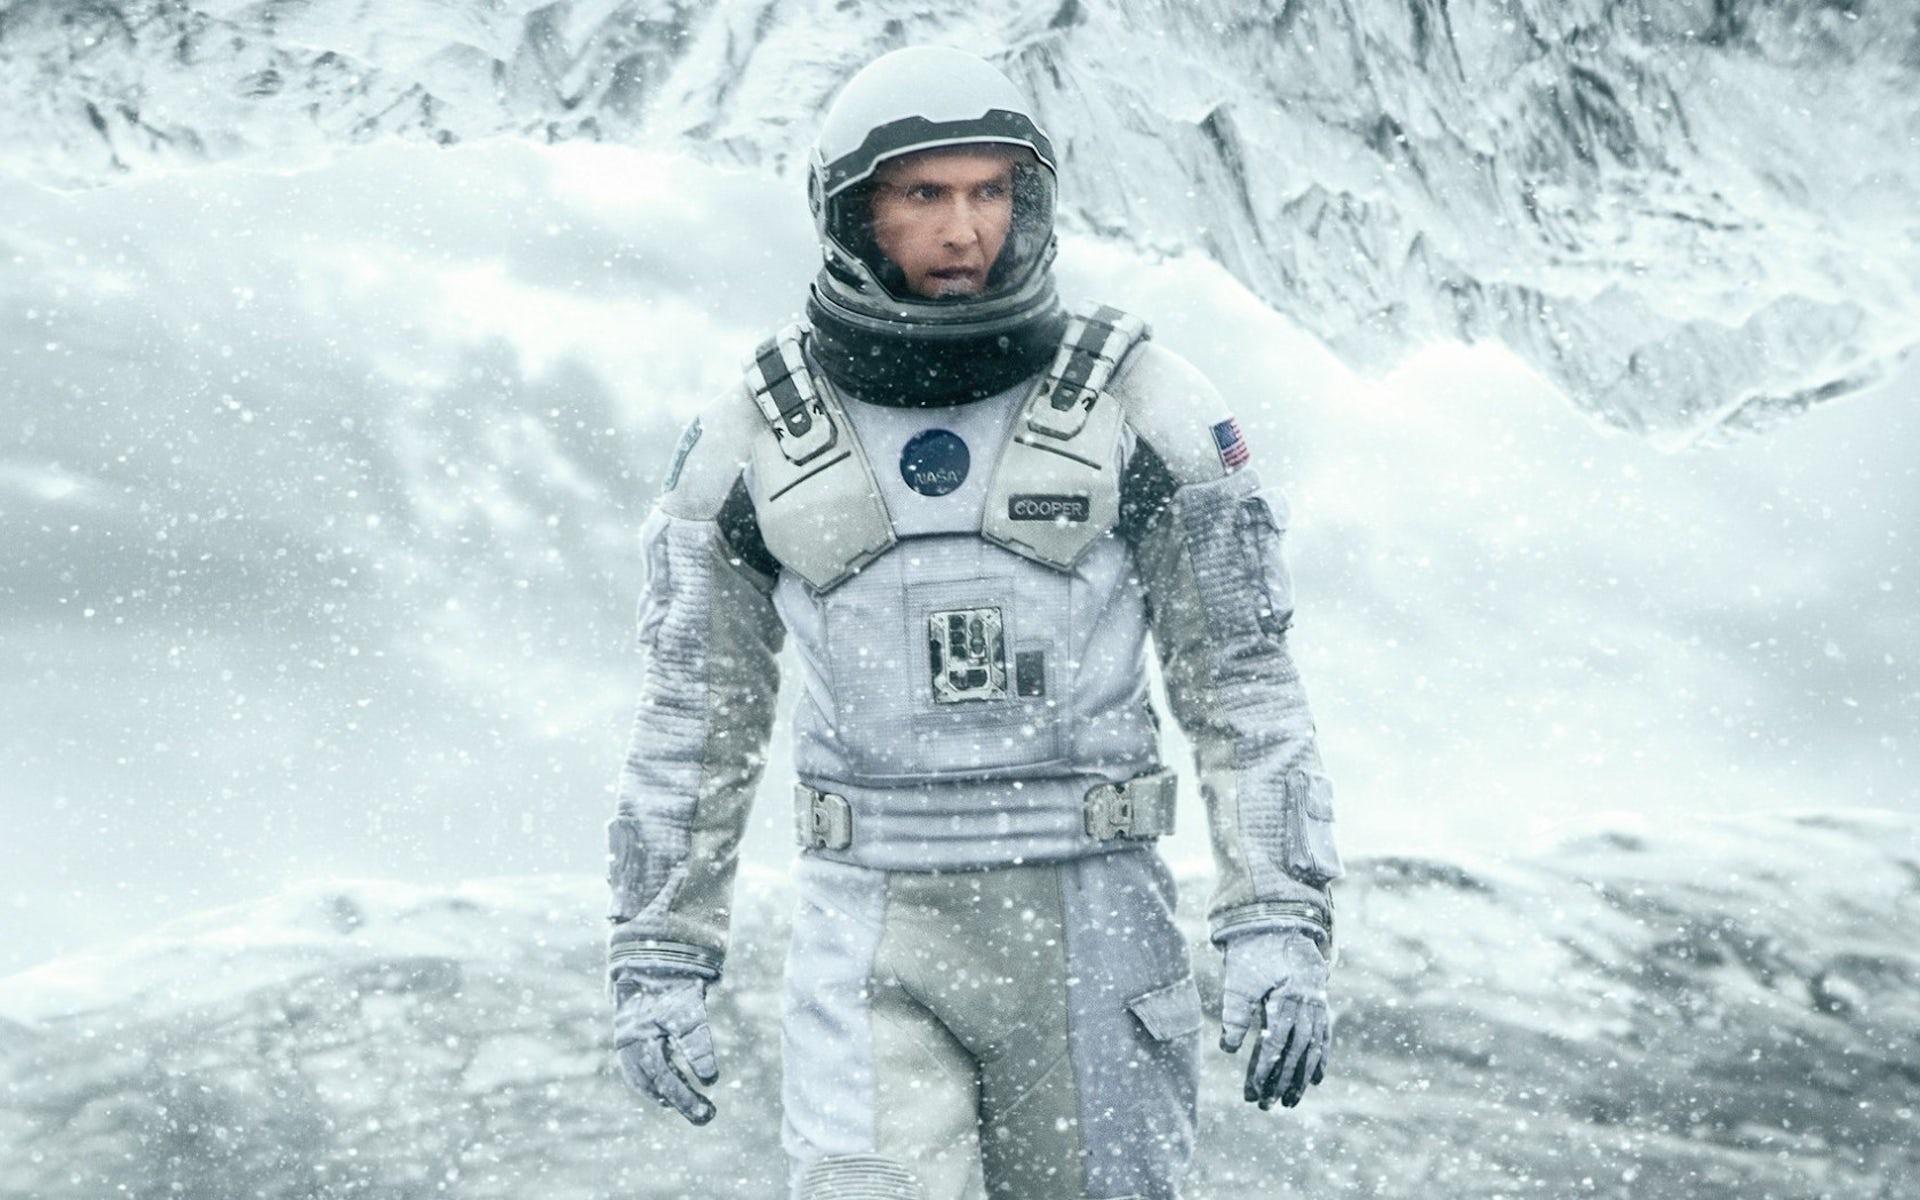 Scientists as Hollywood heroes